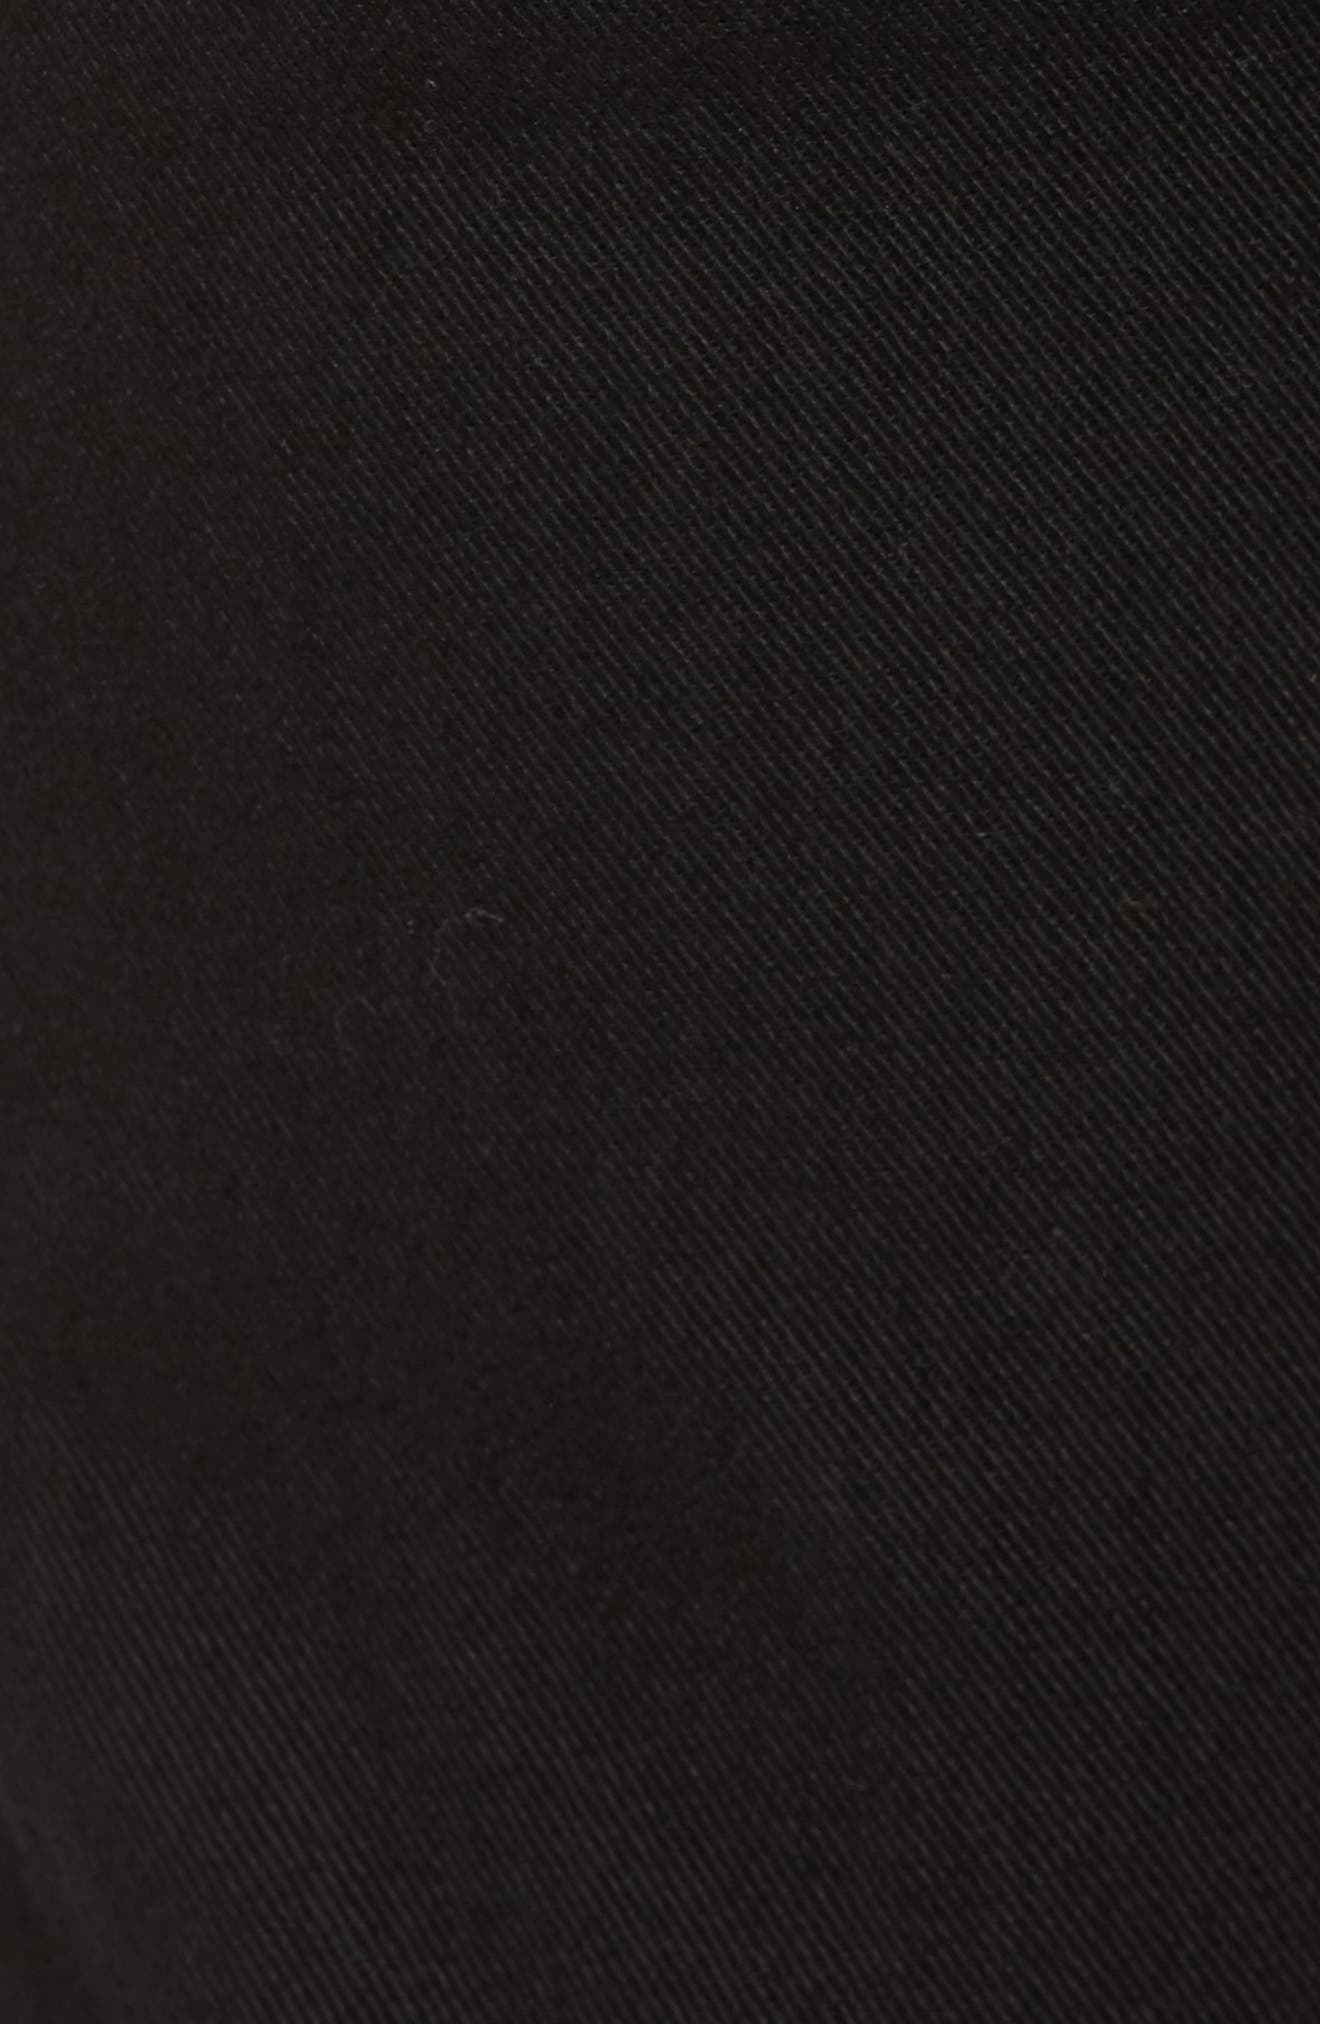 Thommer Slim Fit Jeans,                             Alternate thumbnail 5, color,                             BLACK/ DENIM